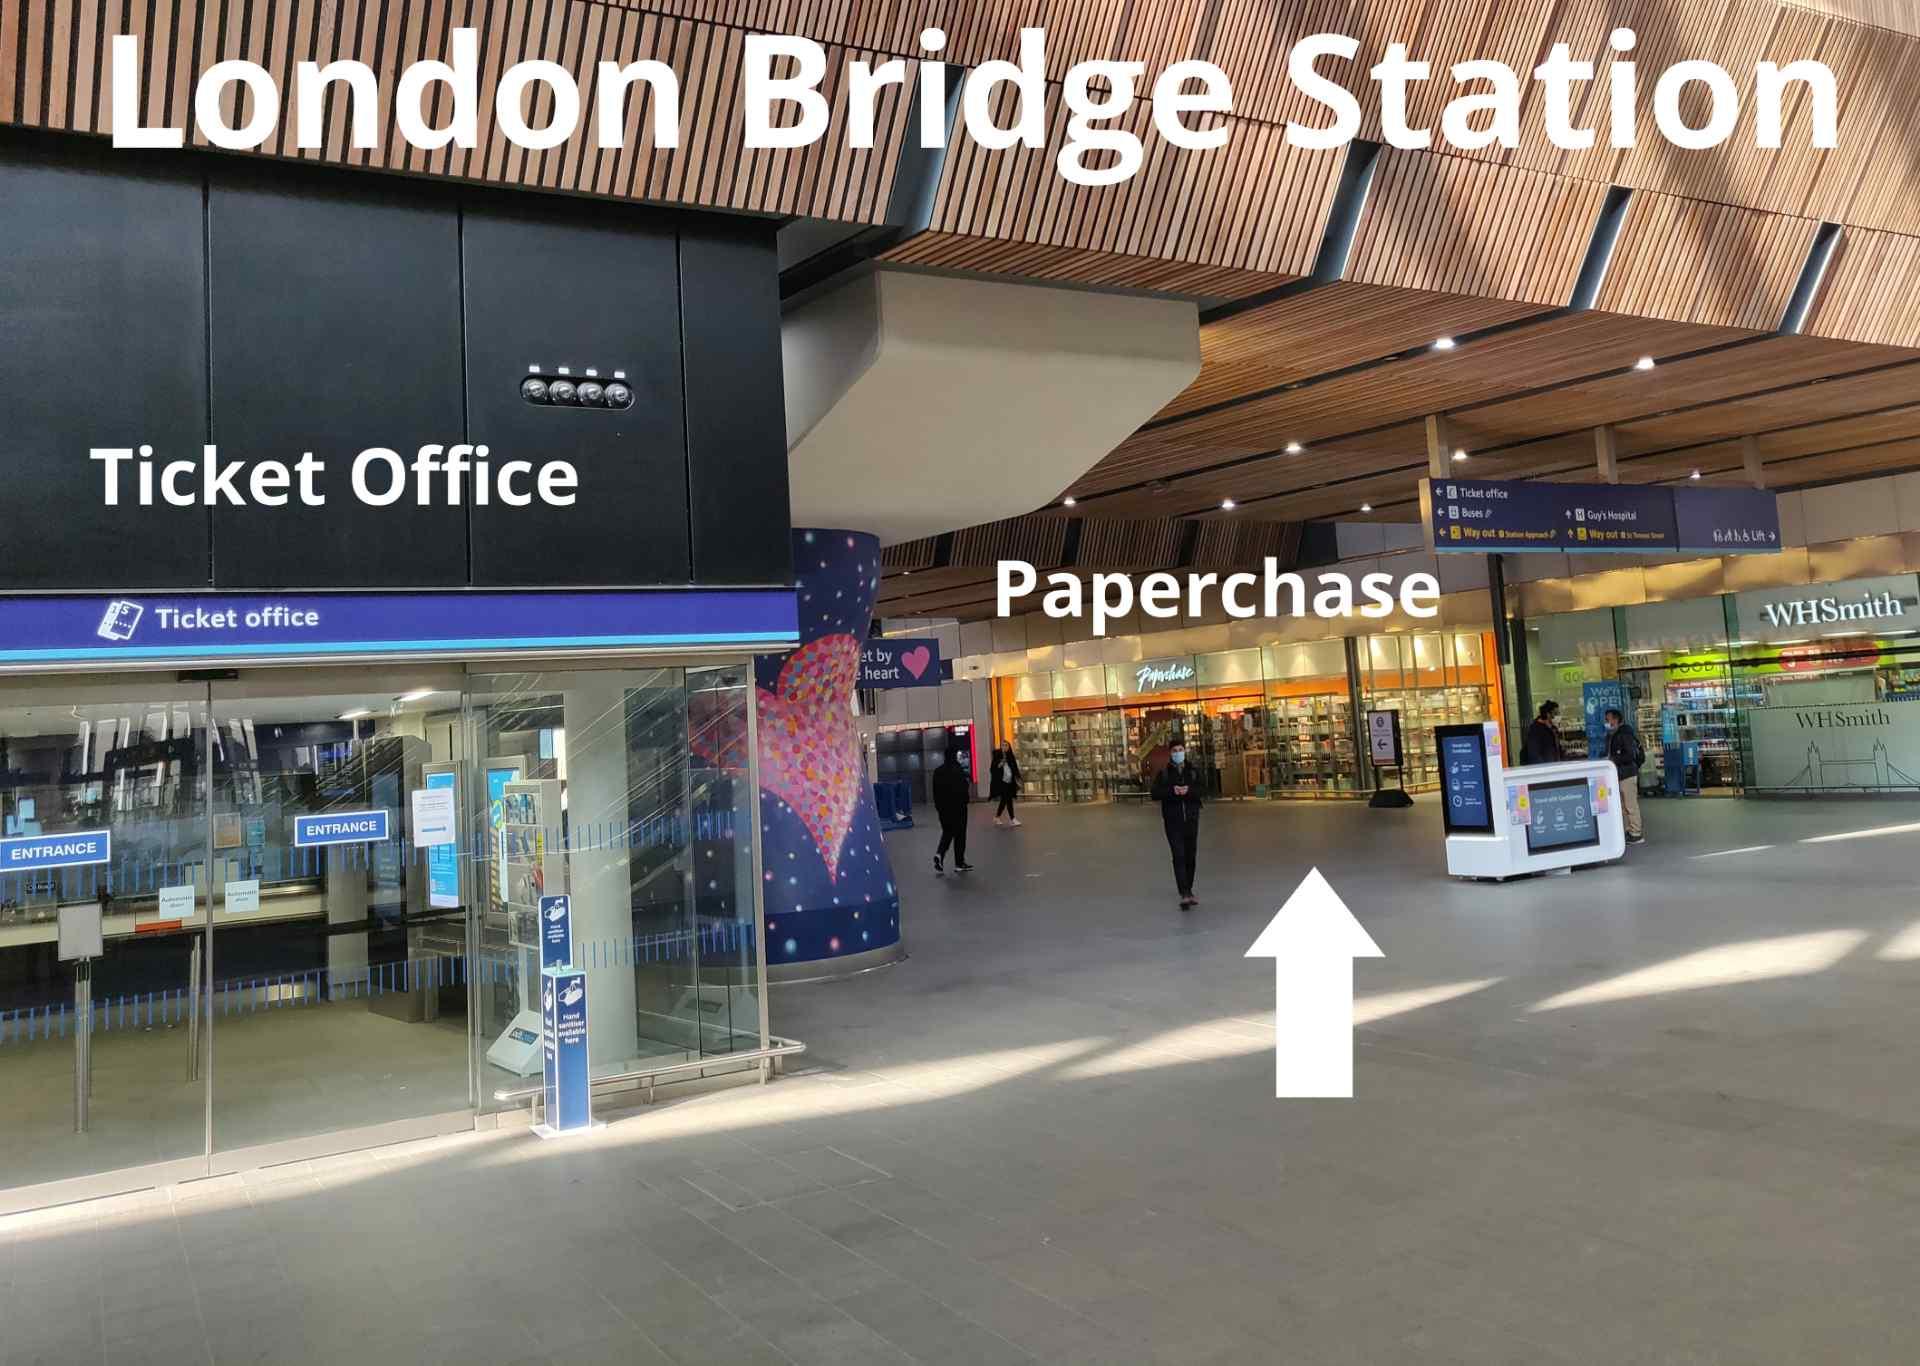 London Bridge Station meeting point